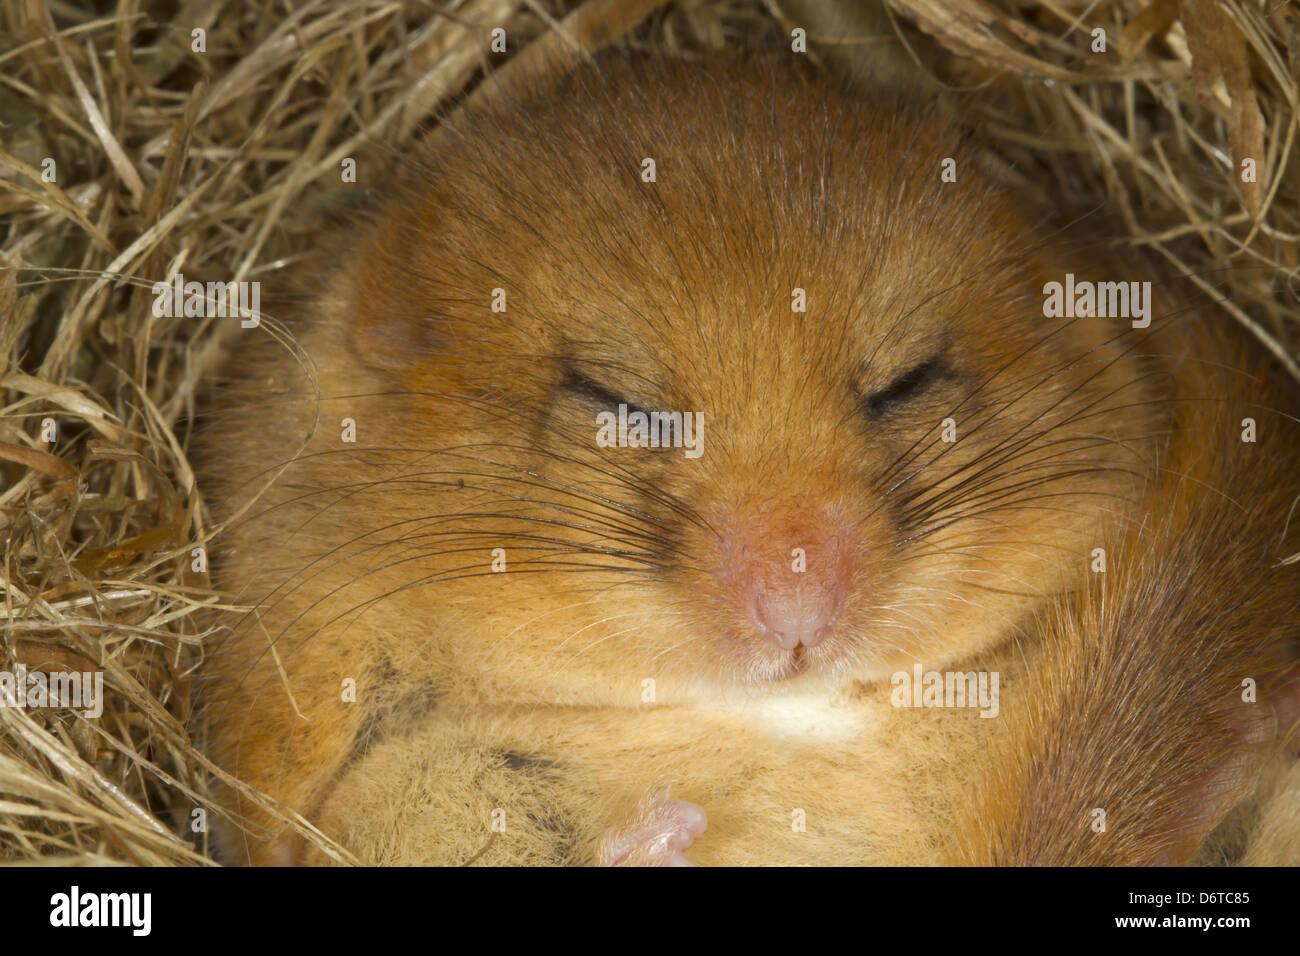 Hazel Dormouse (Muscardinus avellanarius) adult, close-up of head, hibernating in nest, Norfolk, England, January - Stock Image